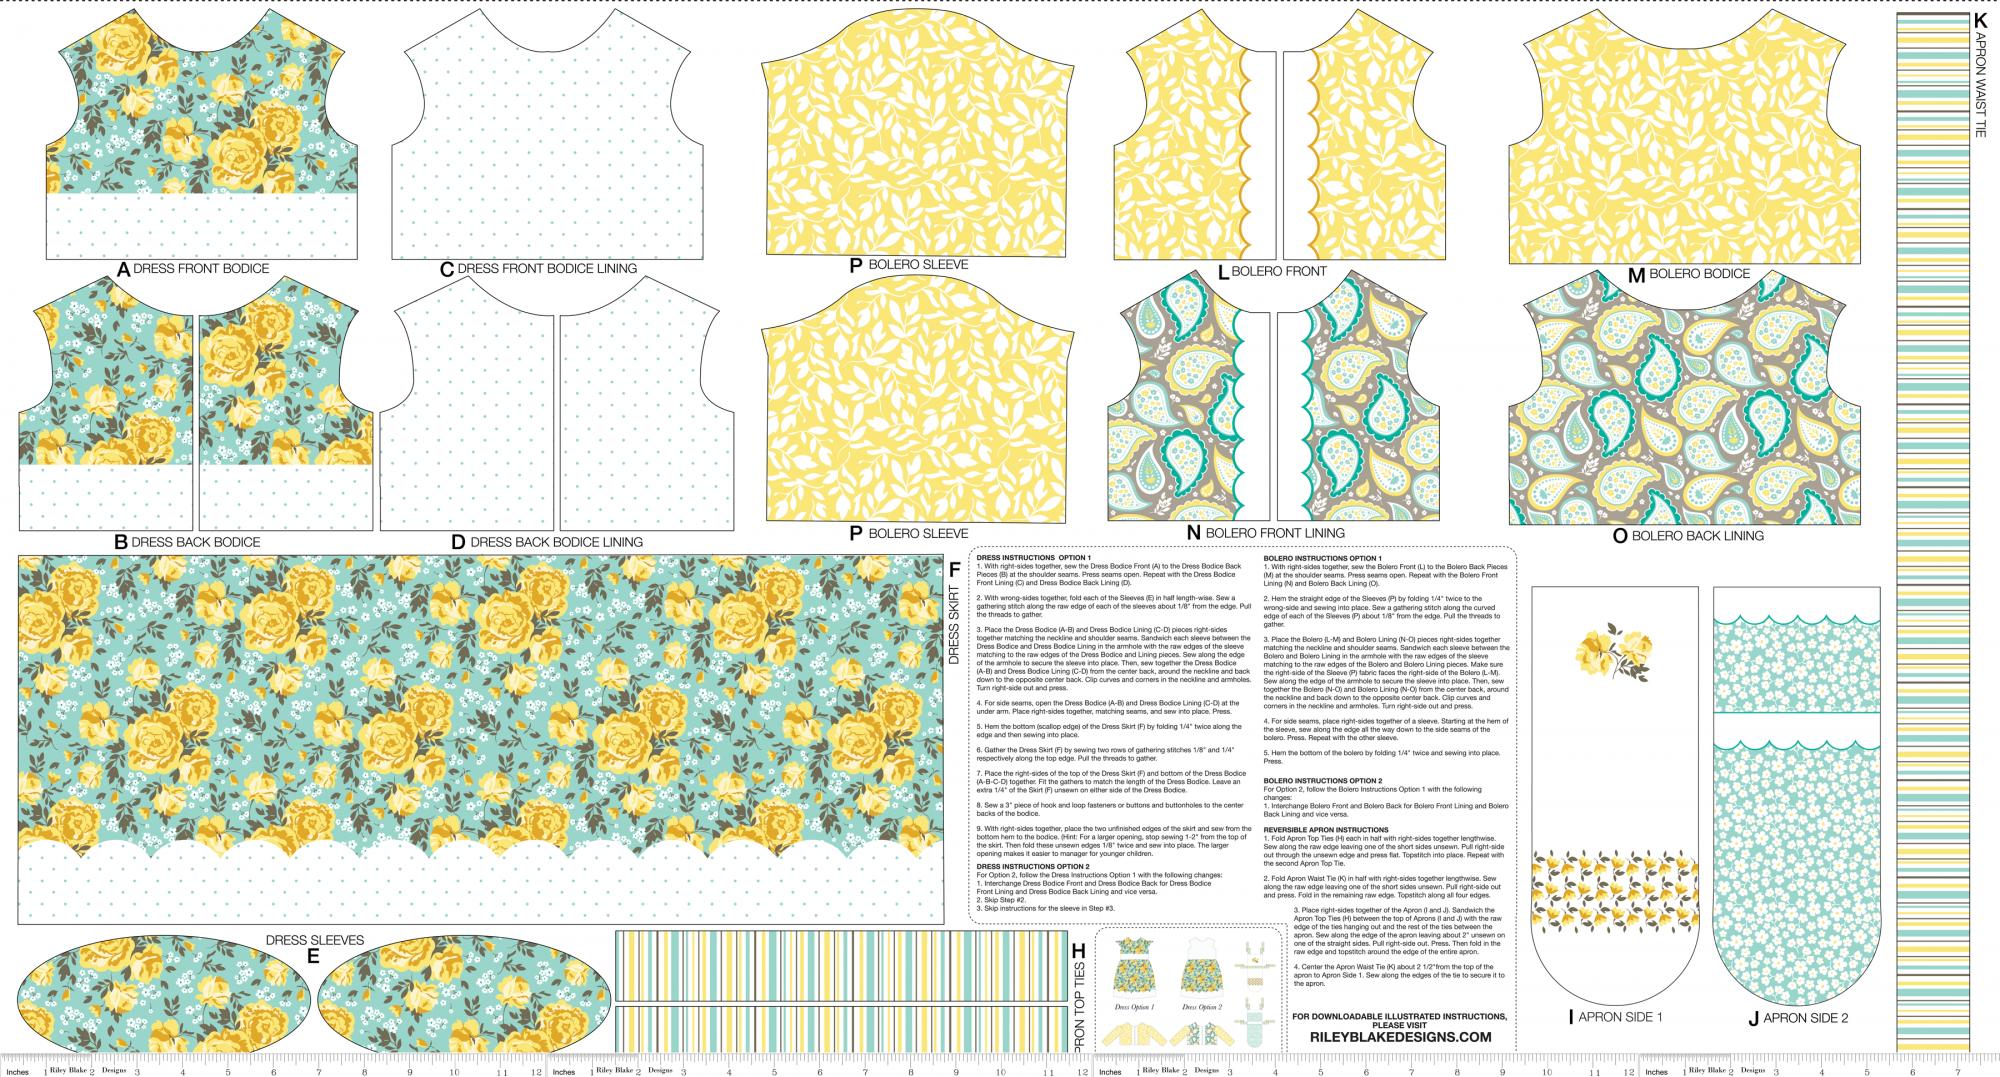 Riley Blake - Primrose Garden - Doll Dress Panel - P4041 Aqua